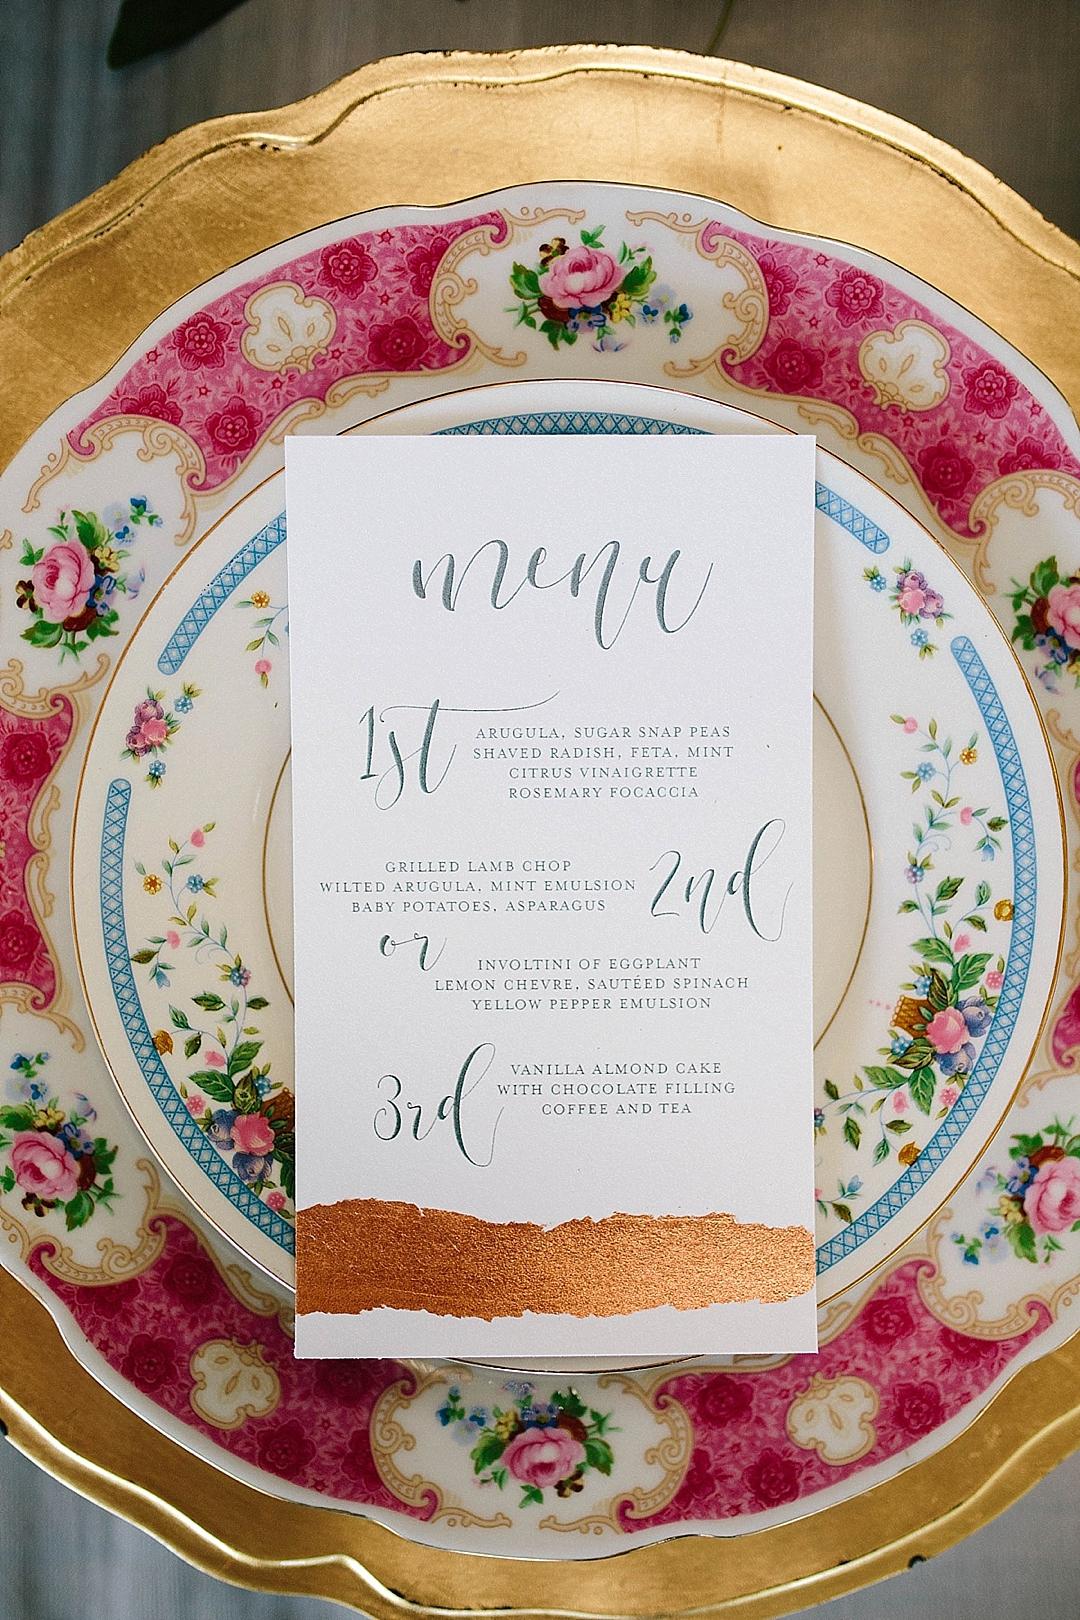 davids bridal for aisle society - menu